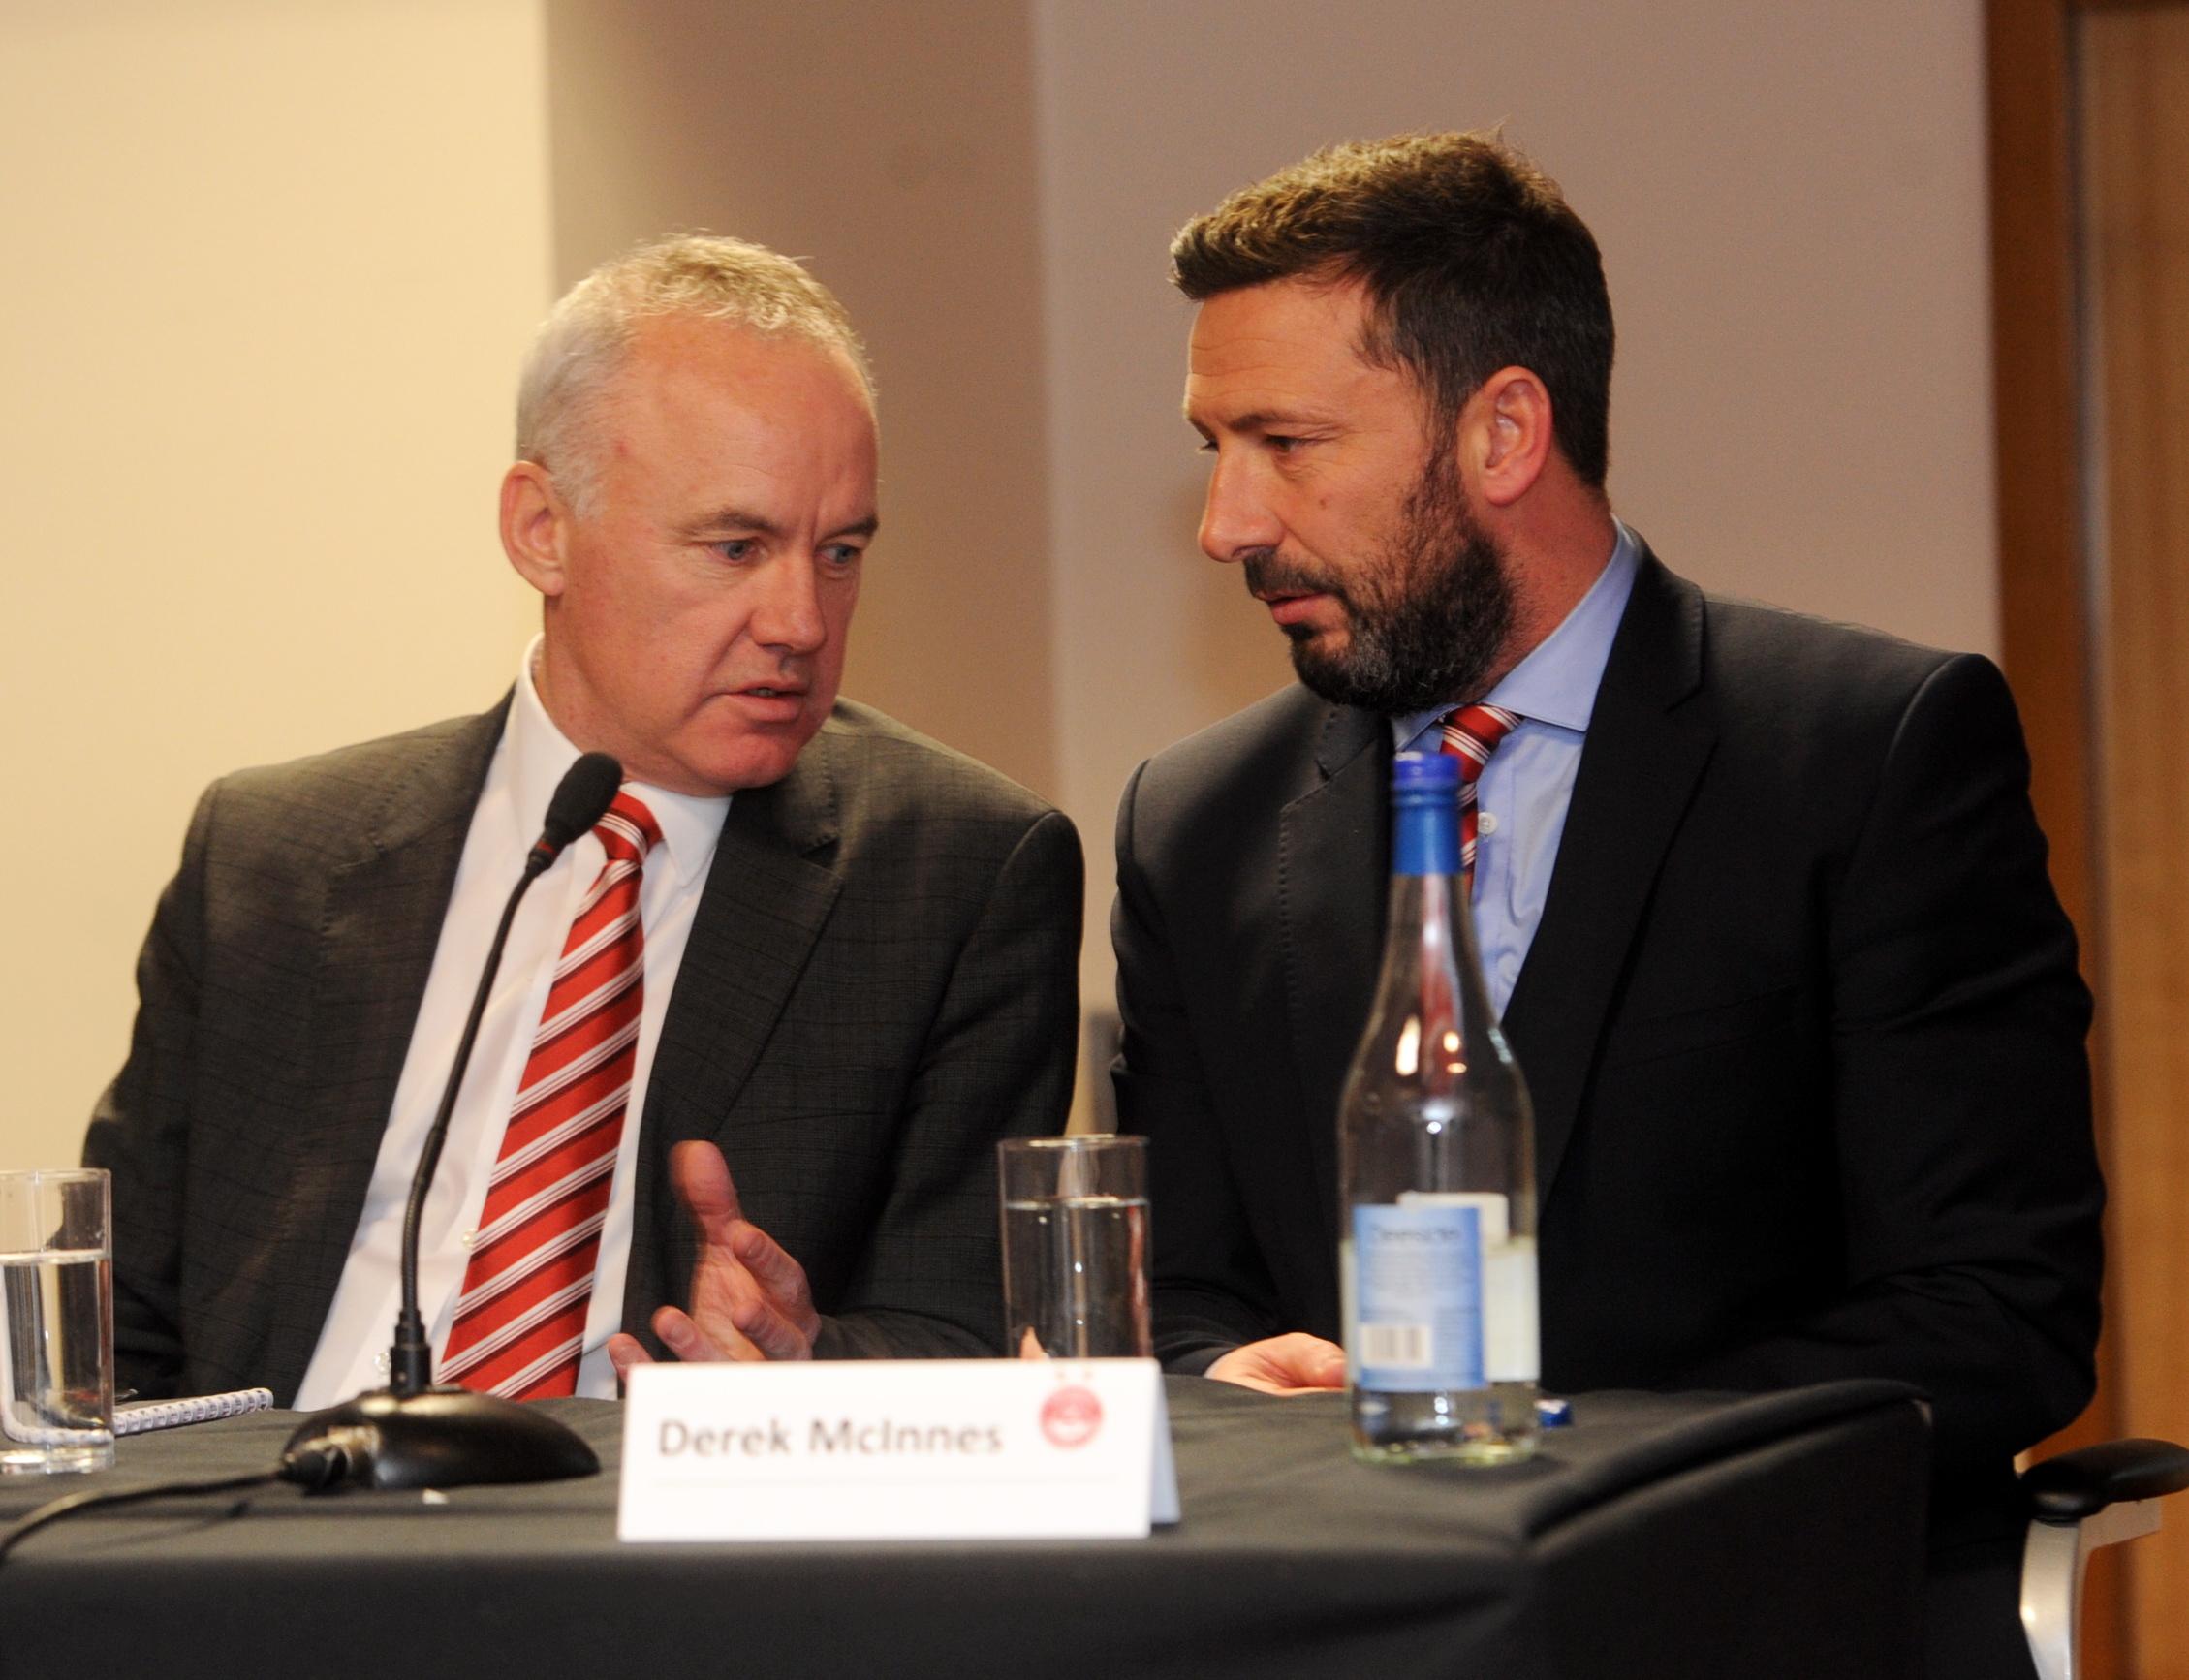 Ian Jack, left,  and Derek McInnes at Aberdeen Football Club's AGM